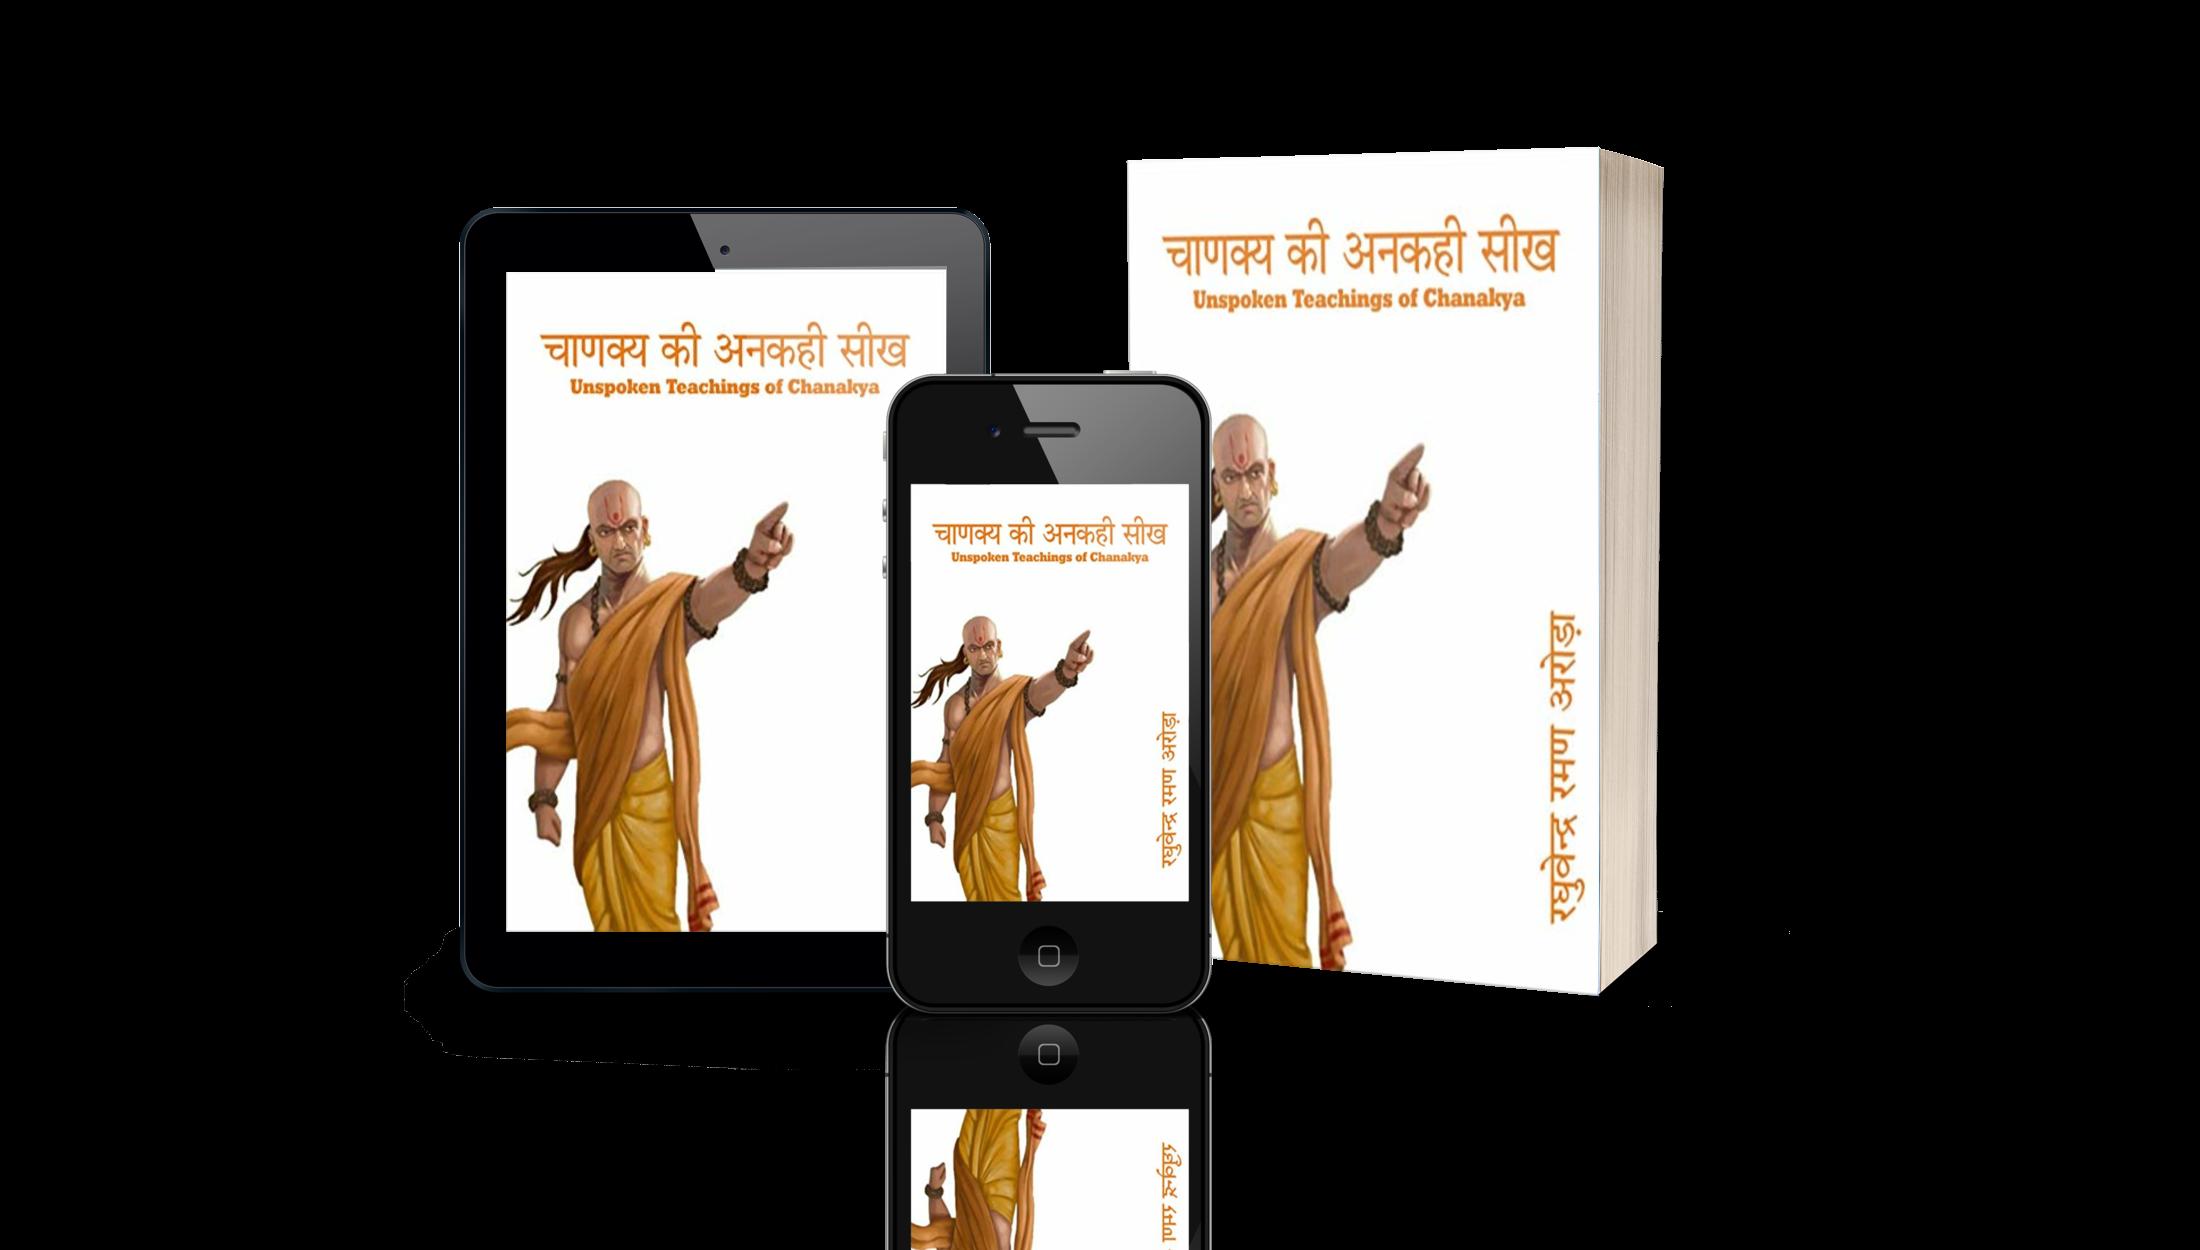 Chanakya ki Ankahee Seekh